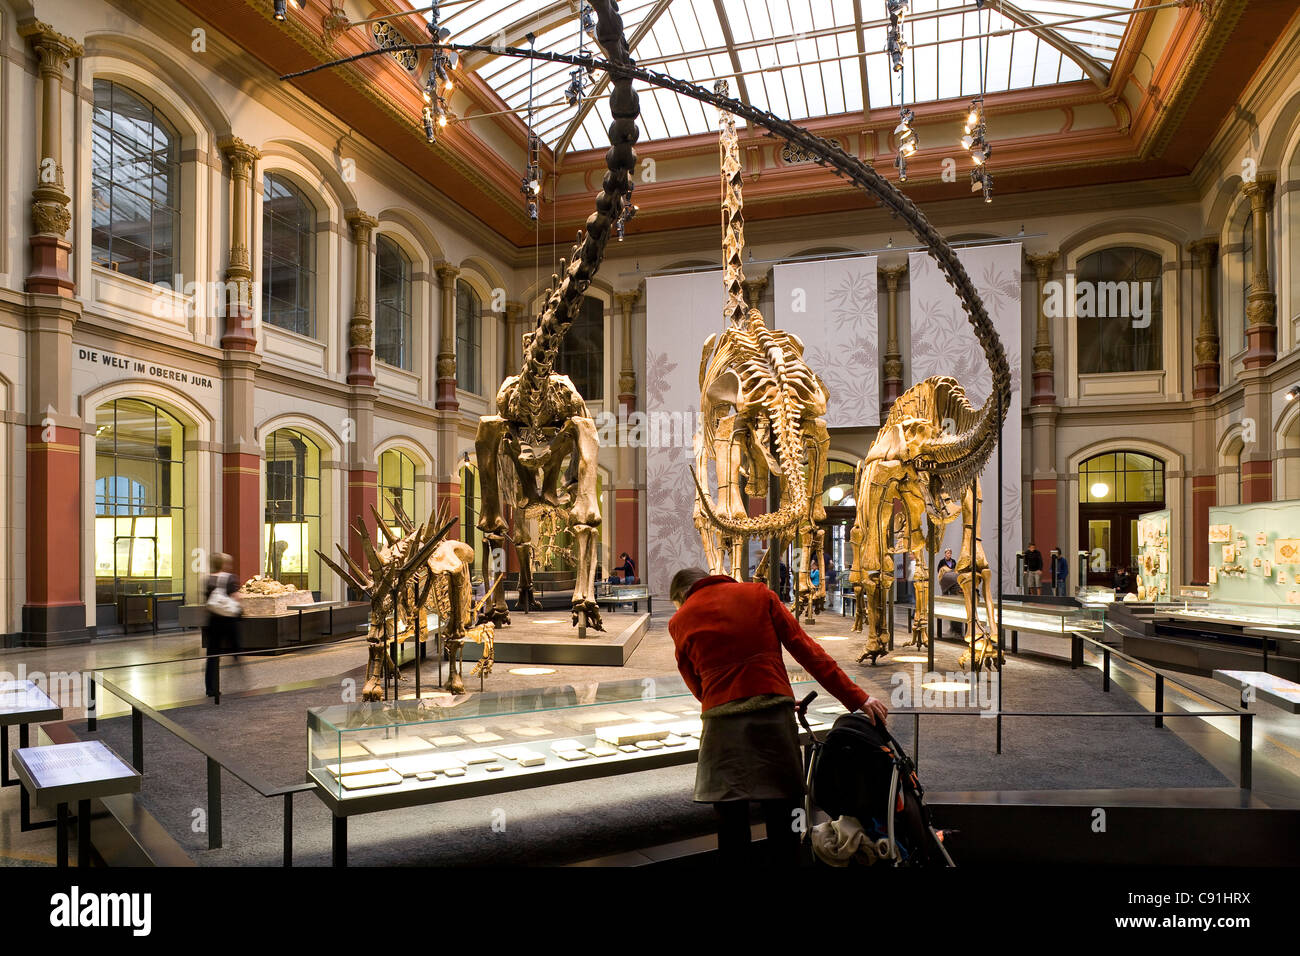 Skeletons of dinosaurs at Berlin Museum of Natural History, Invalidenstrasse, Berlin-Mitte, Berlin, Germany, Europe - Stock Image